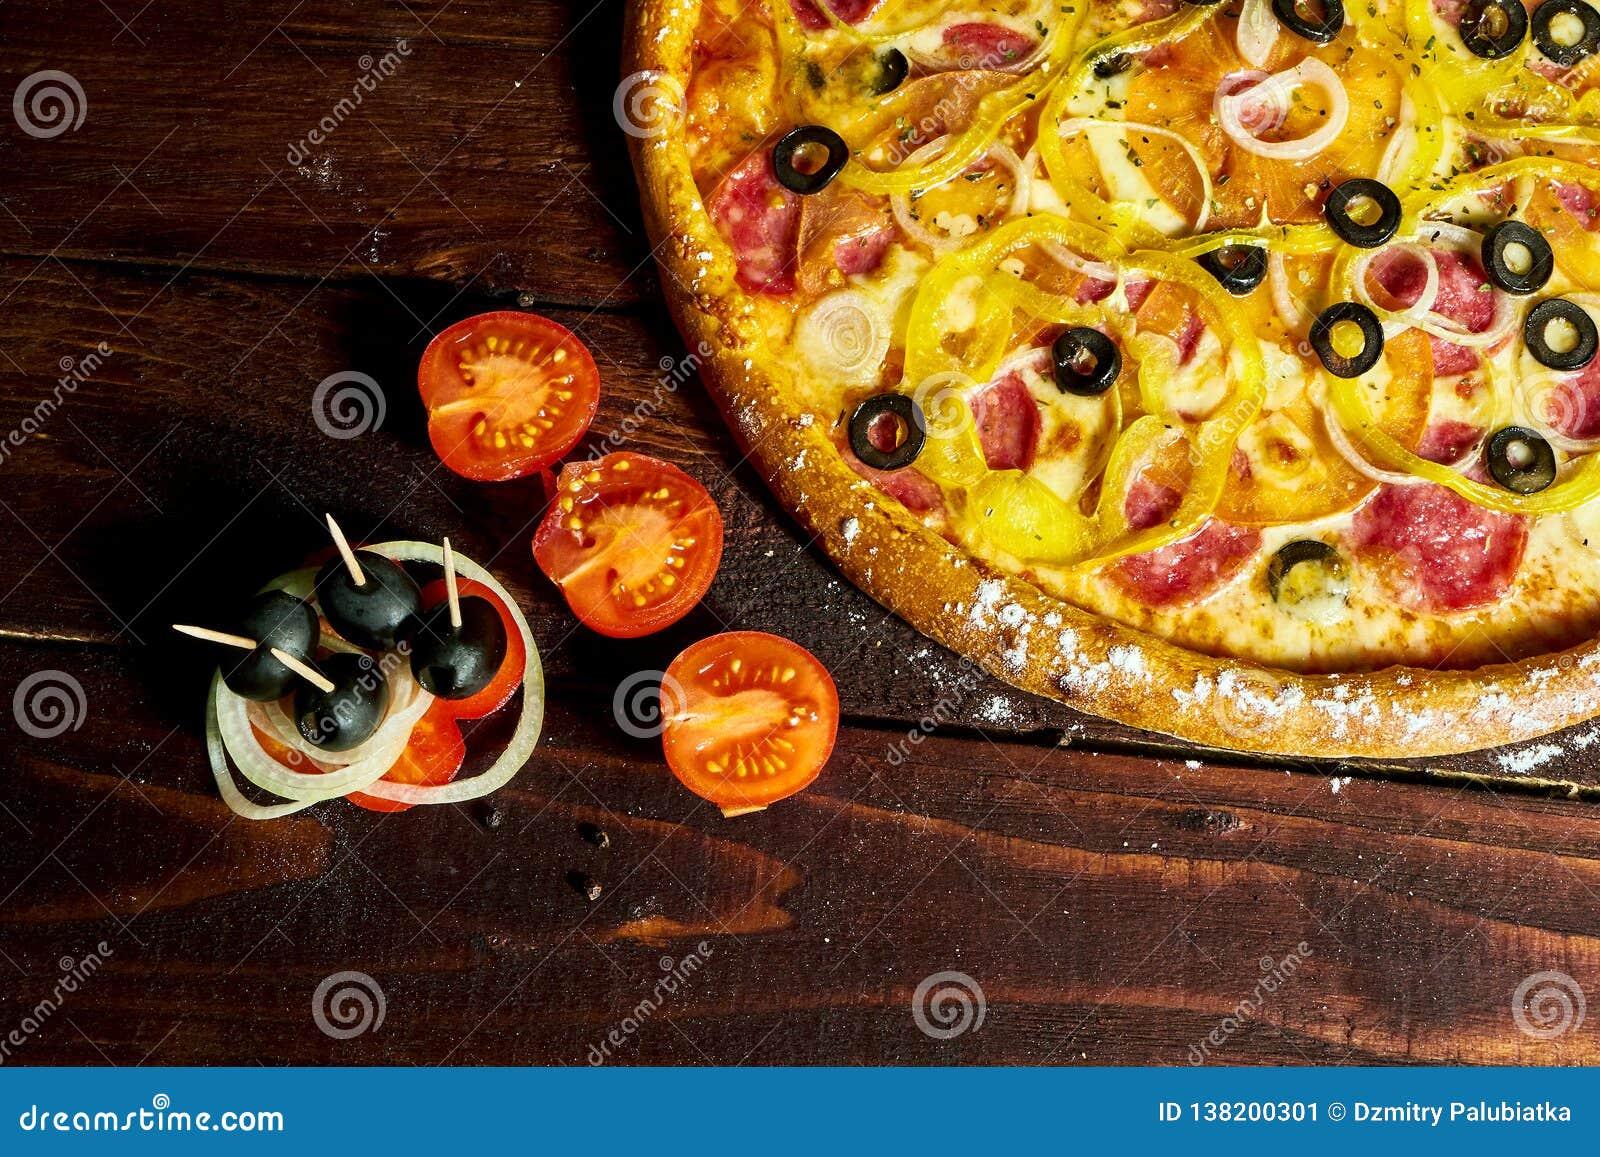 Włoska pizza z oliwkami ser i salami